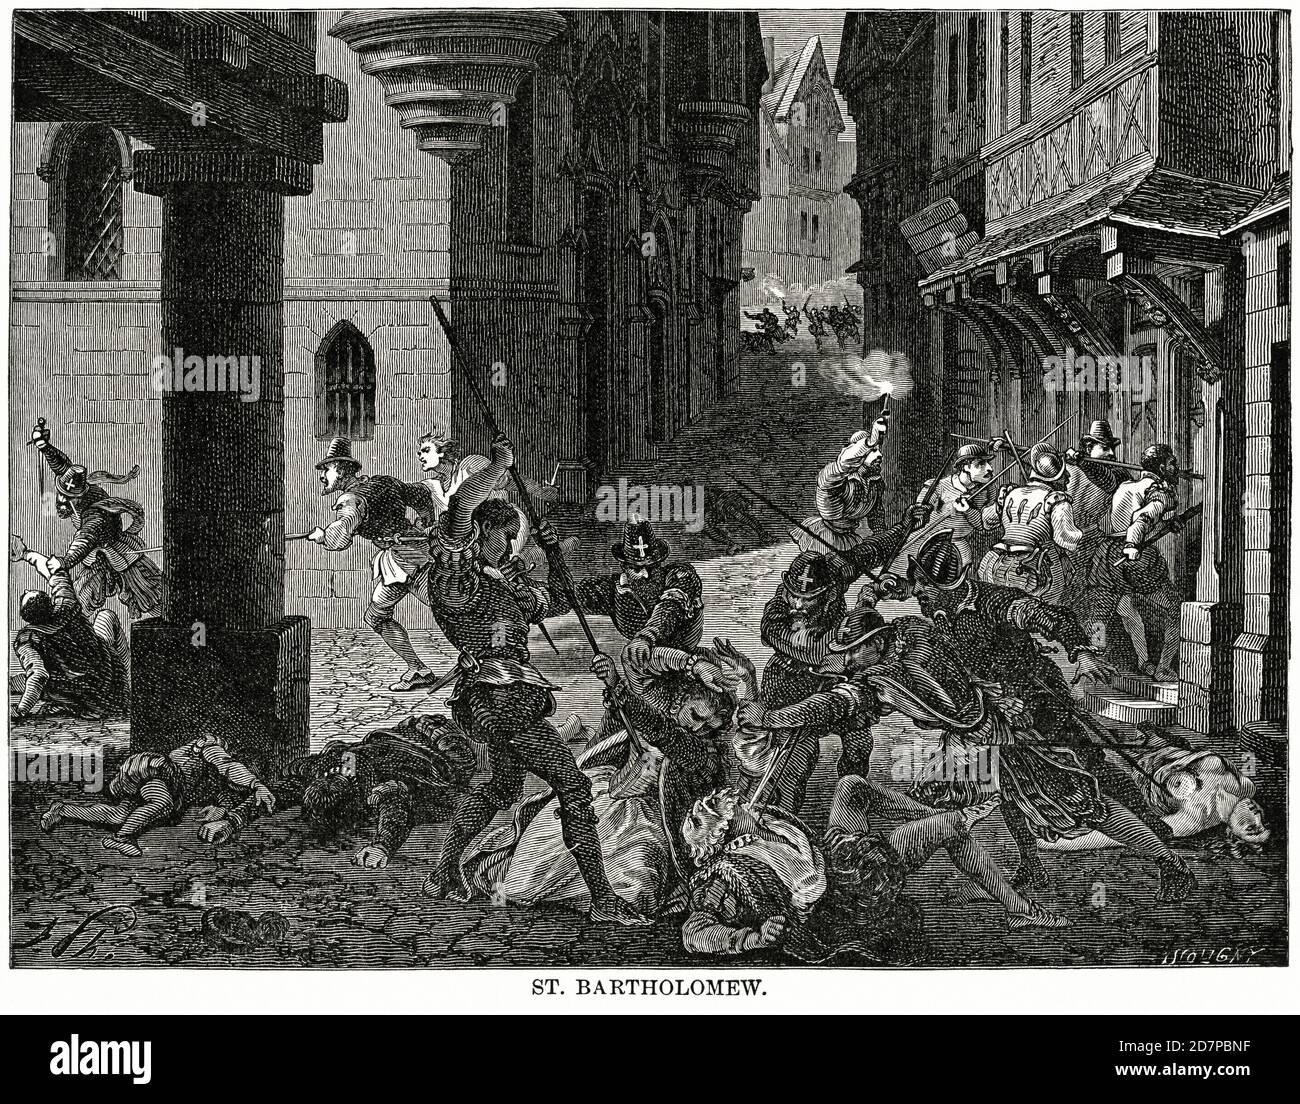 St. Bartholomew St. Bartholomew's Day massacre), Illustration, Ridpath's History of the World, Volume III, by John Clark Ridpath, LL. D., Merrill & Baker Publishers, New York, 1897 Stock Photo